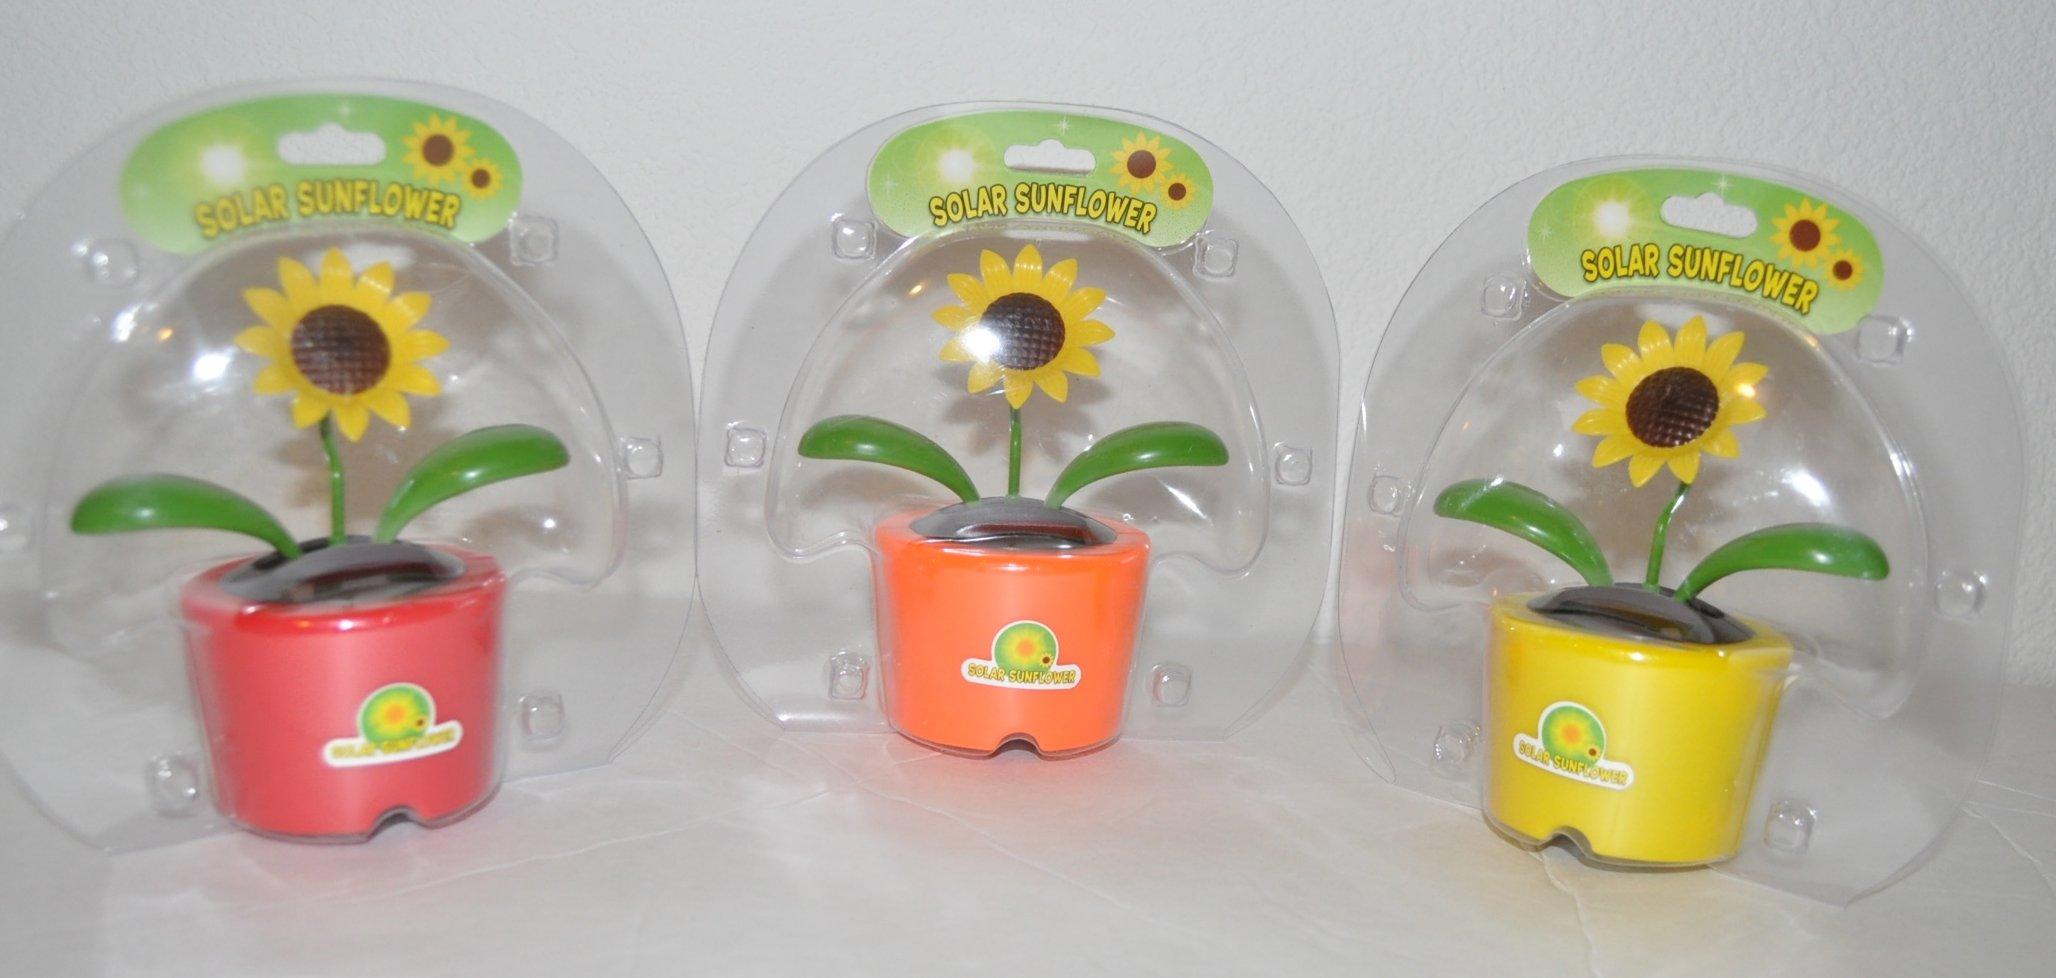 Solar-Powered Plastic Dancing Flowers, Pack of 3-Red, Orange, Yellow Pot